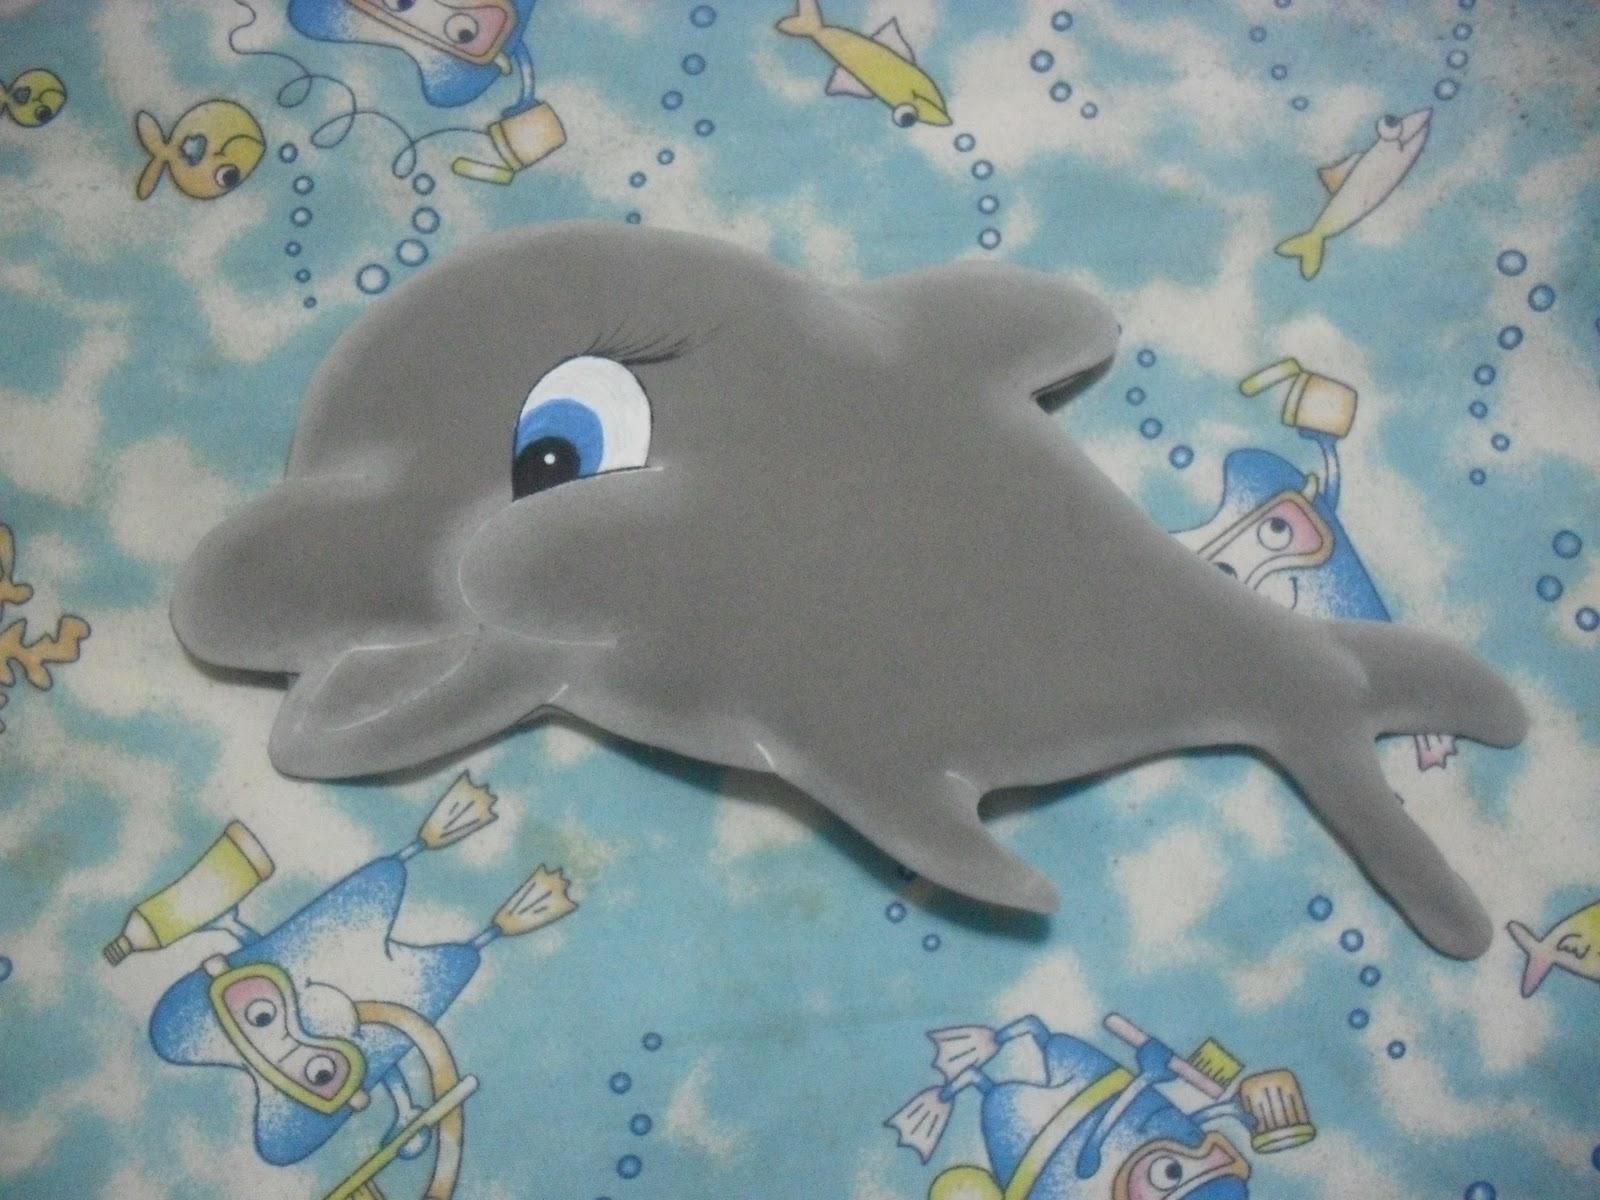 Moldes de delfines en foami - Imagui